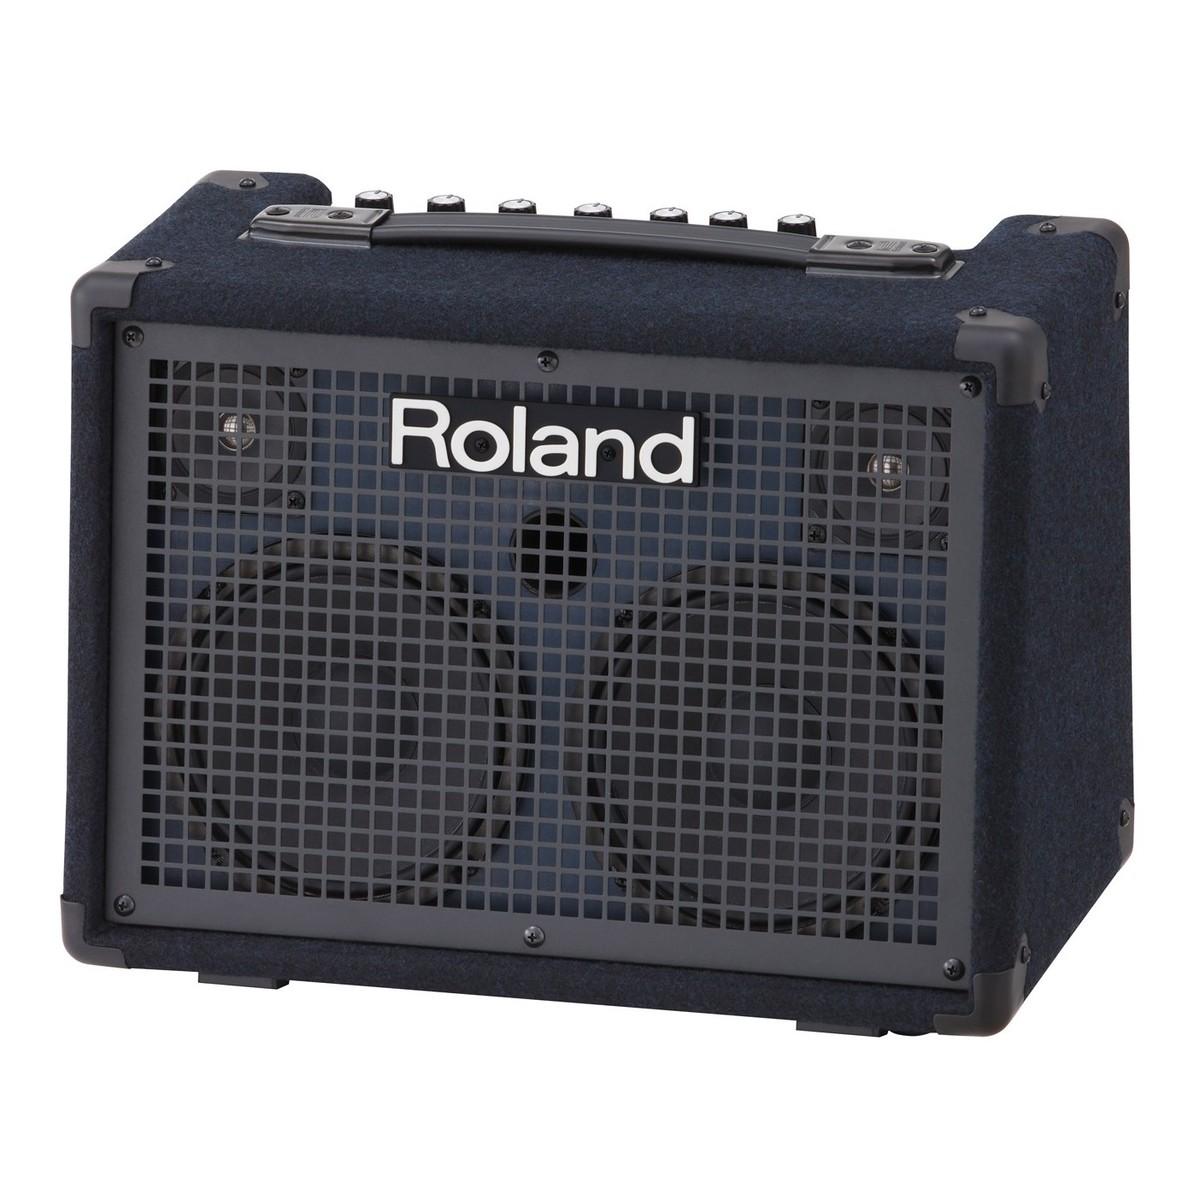 roland kc 220 battery powered keyboard amplifier at gear4music. Black Bedroom Furniture Sets. Home Design Ideas